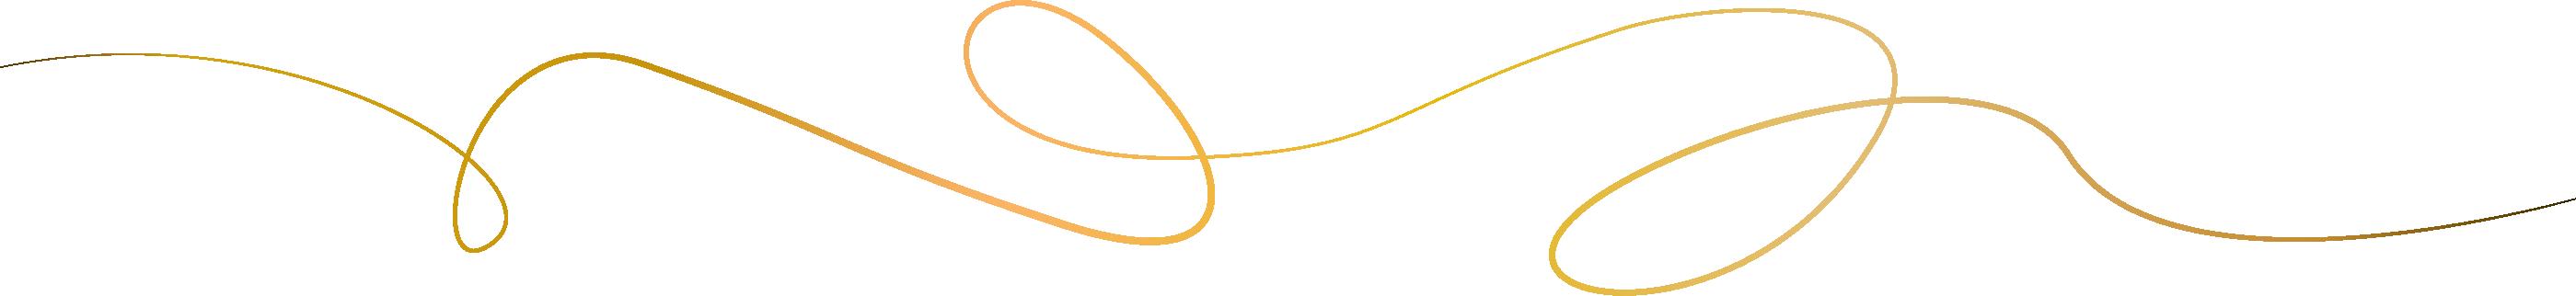 Golden_Thread_Digital_Twins